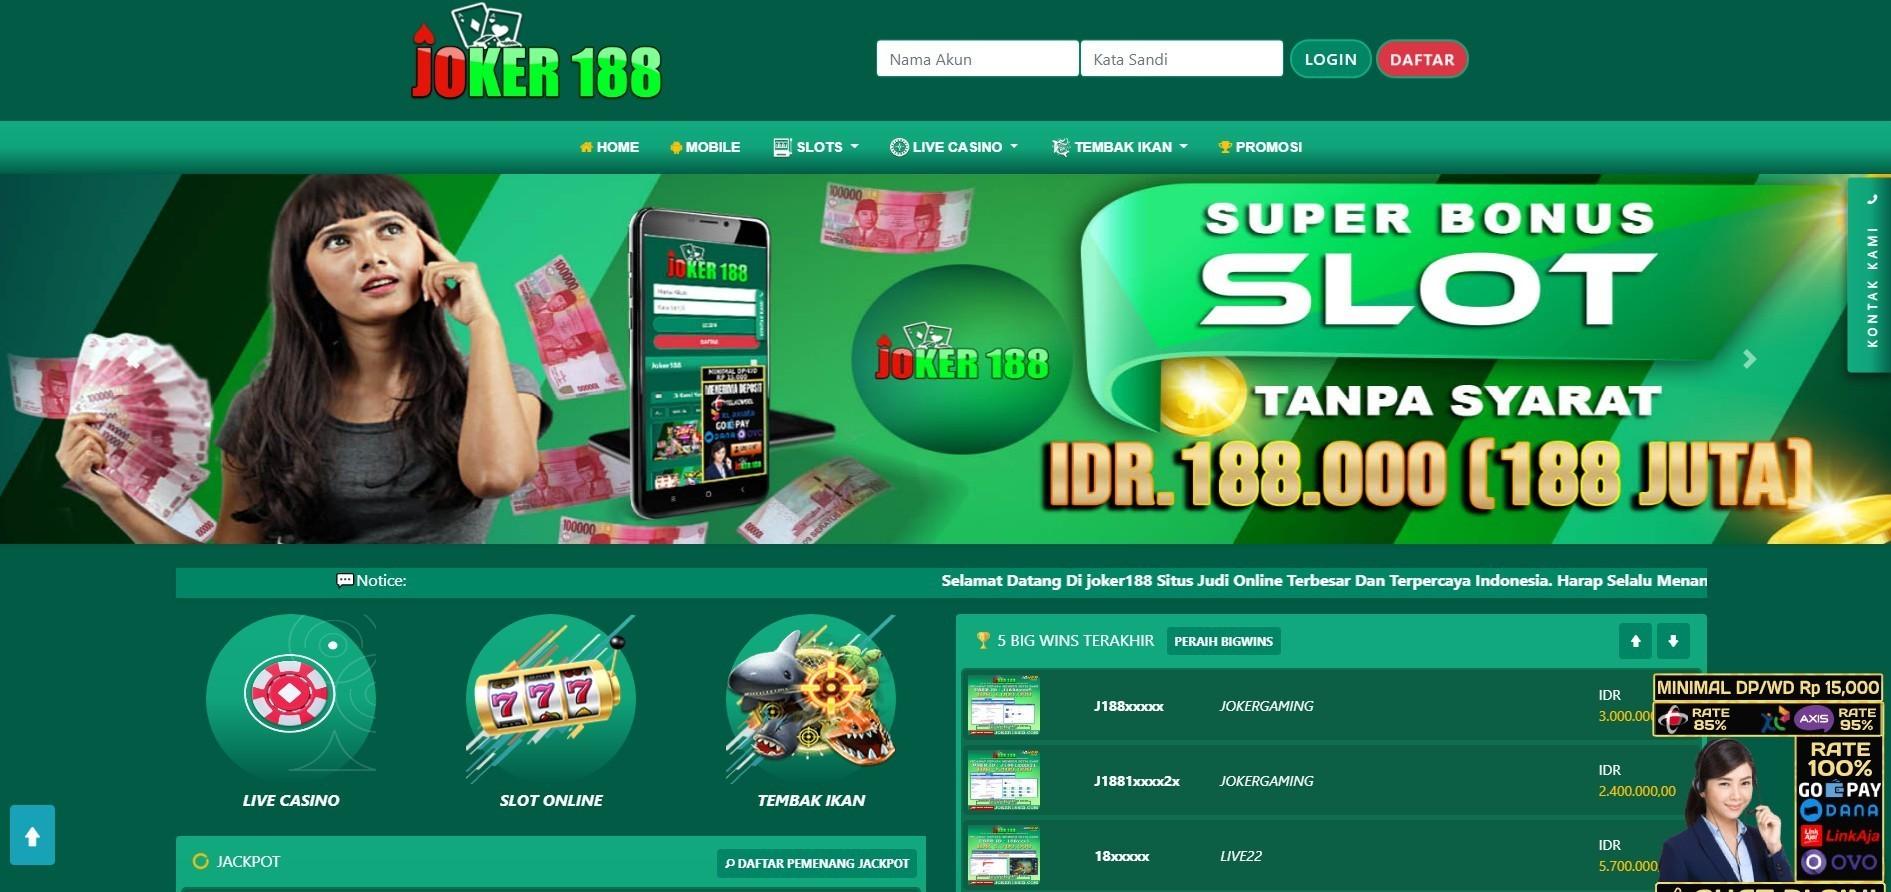 Jual Tiket Joker188 Situs Mesin Slots Online Deposit Aplikasi Linkaja Loket Com